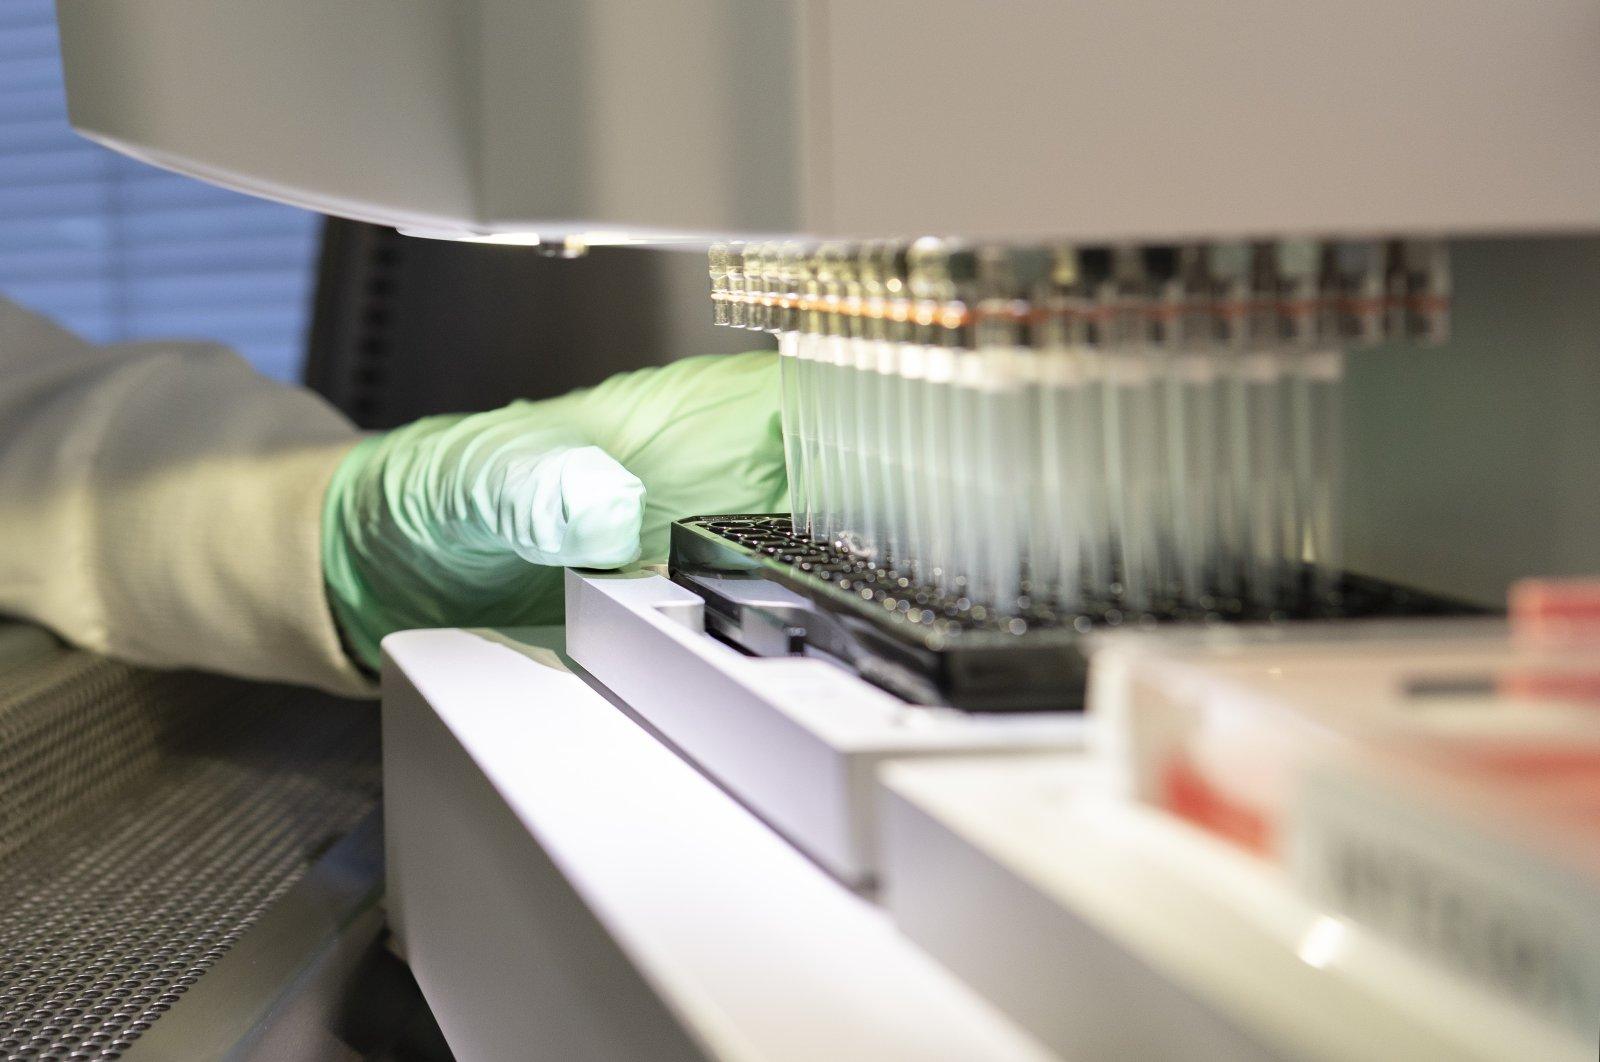 A researcher works on the development of the medication aducanumab in Cambridge, Massachusetts, U.S. (Biogen via AP)